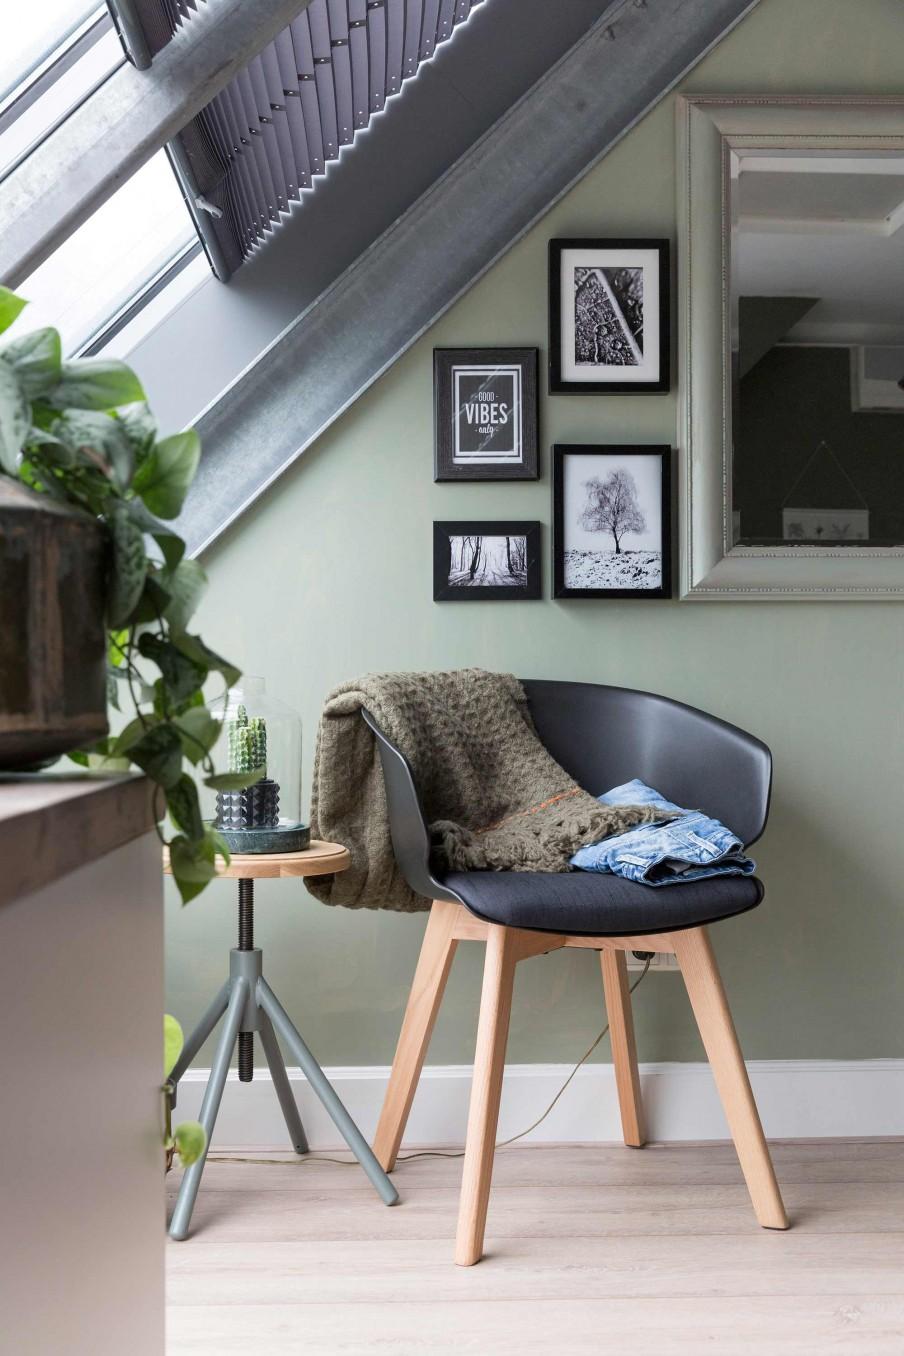 06-muebles-modernos